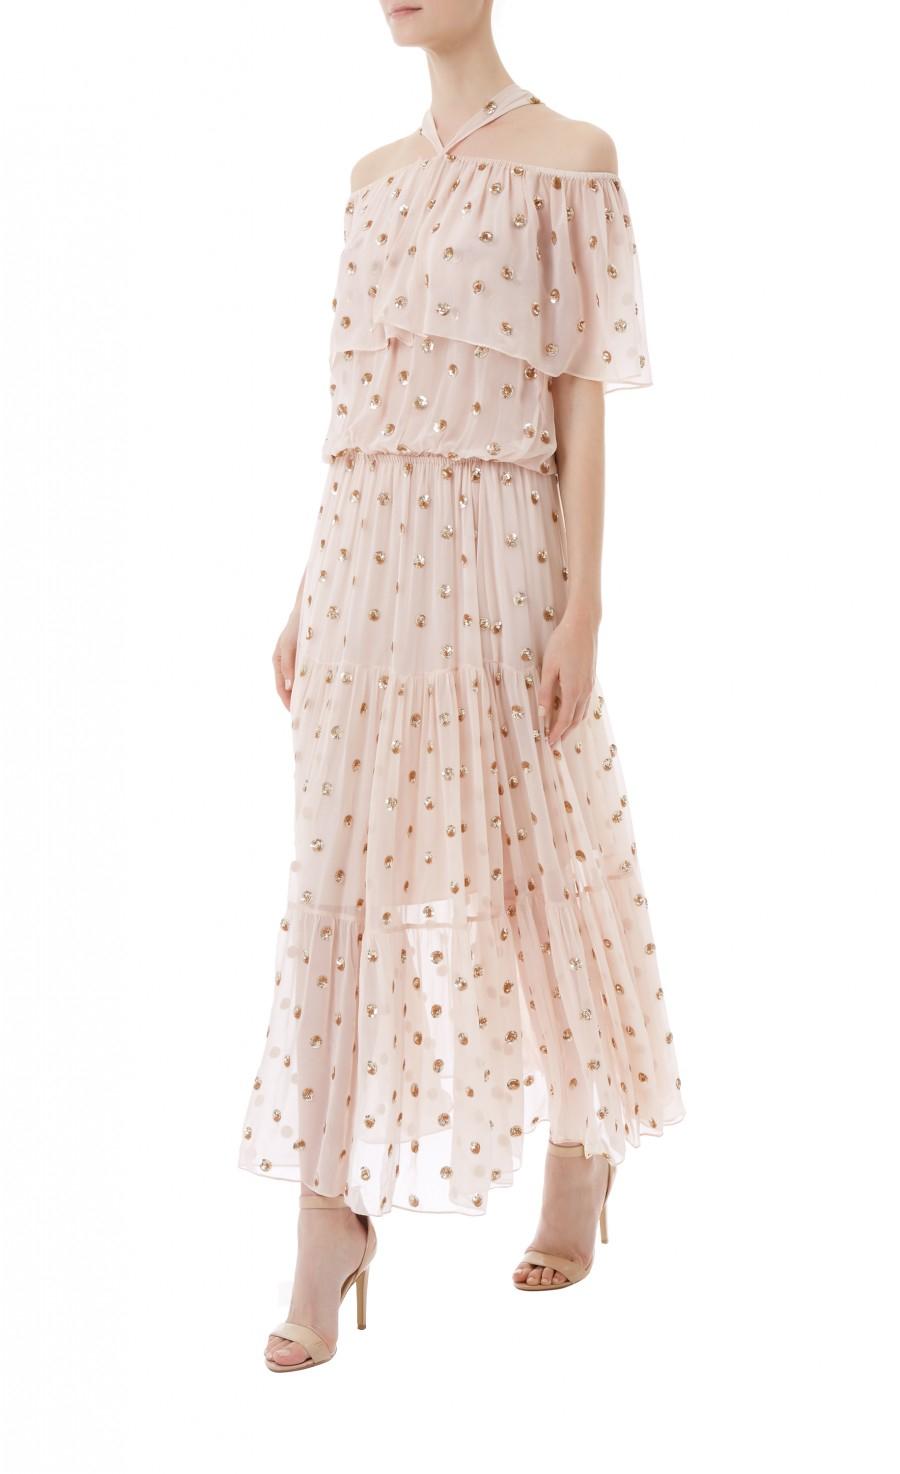 Lyst Temperley London Jolie Polka Dot Dress Clothing Joie Midi Nude M